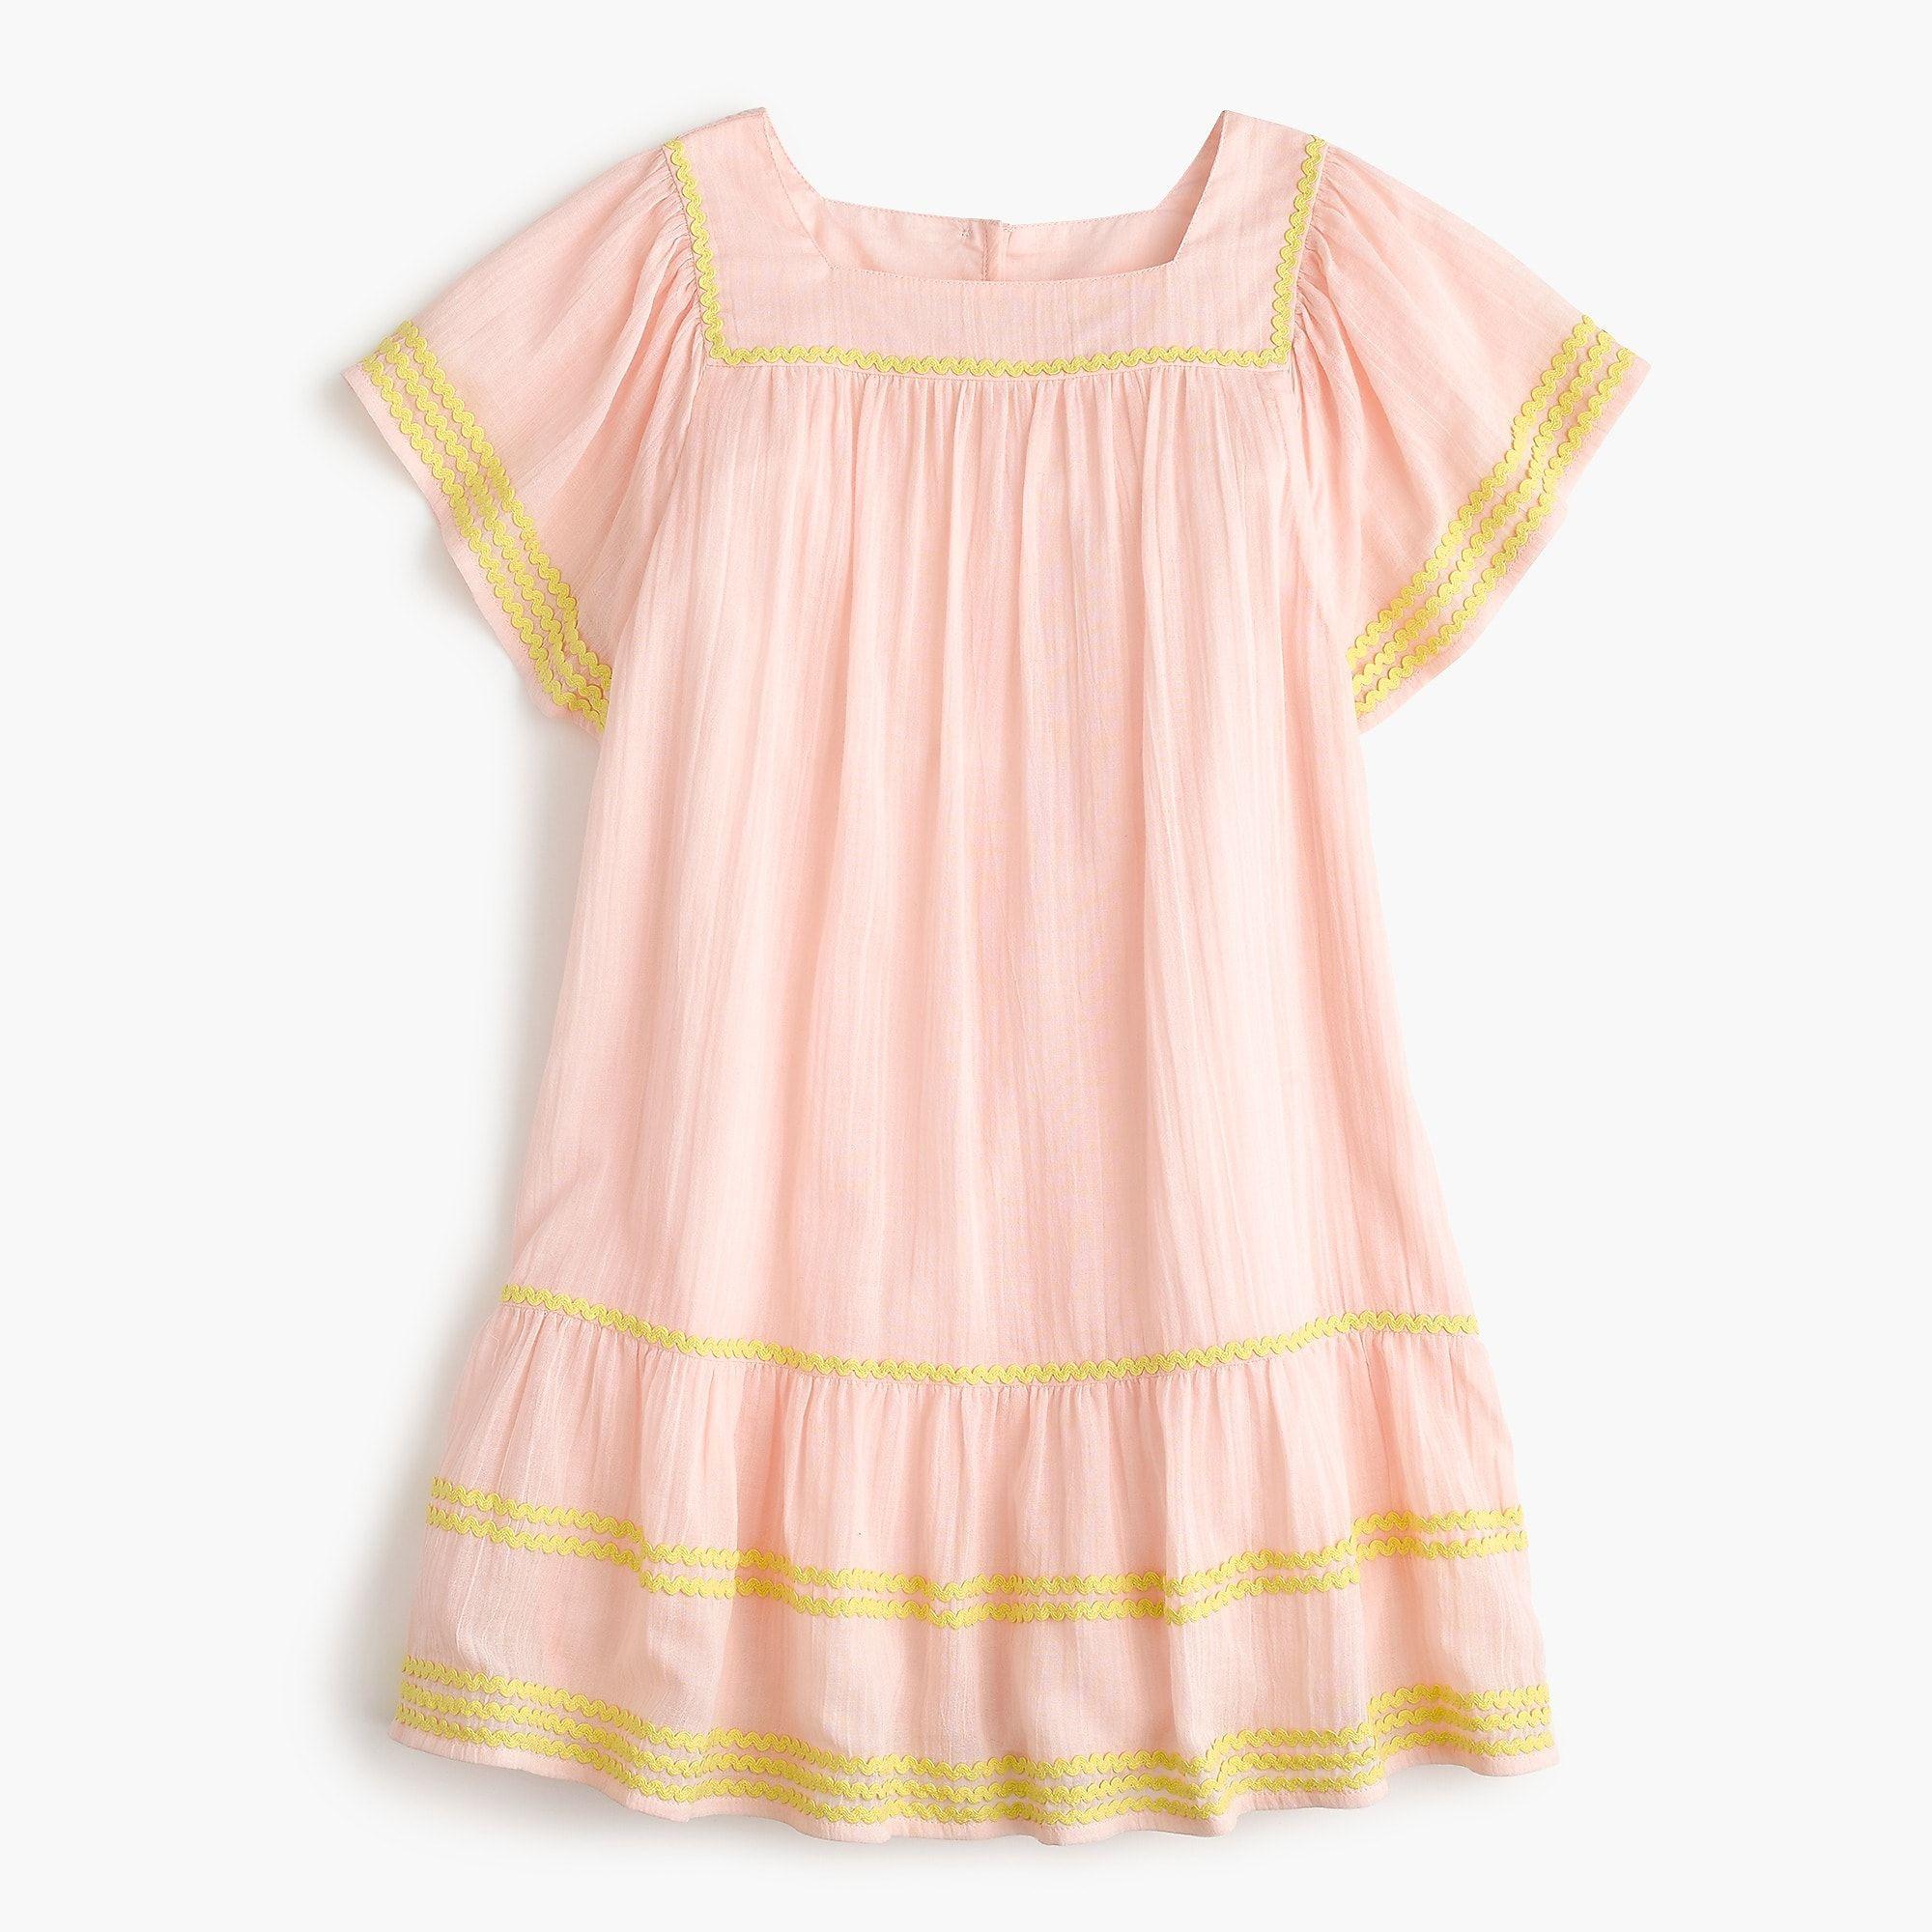 2c79de90d Girls' stretch denim white overall | Kindergarten | Dresses, Toddler ...